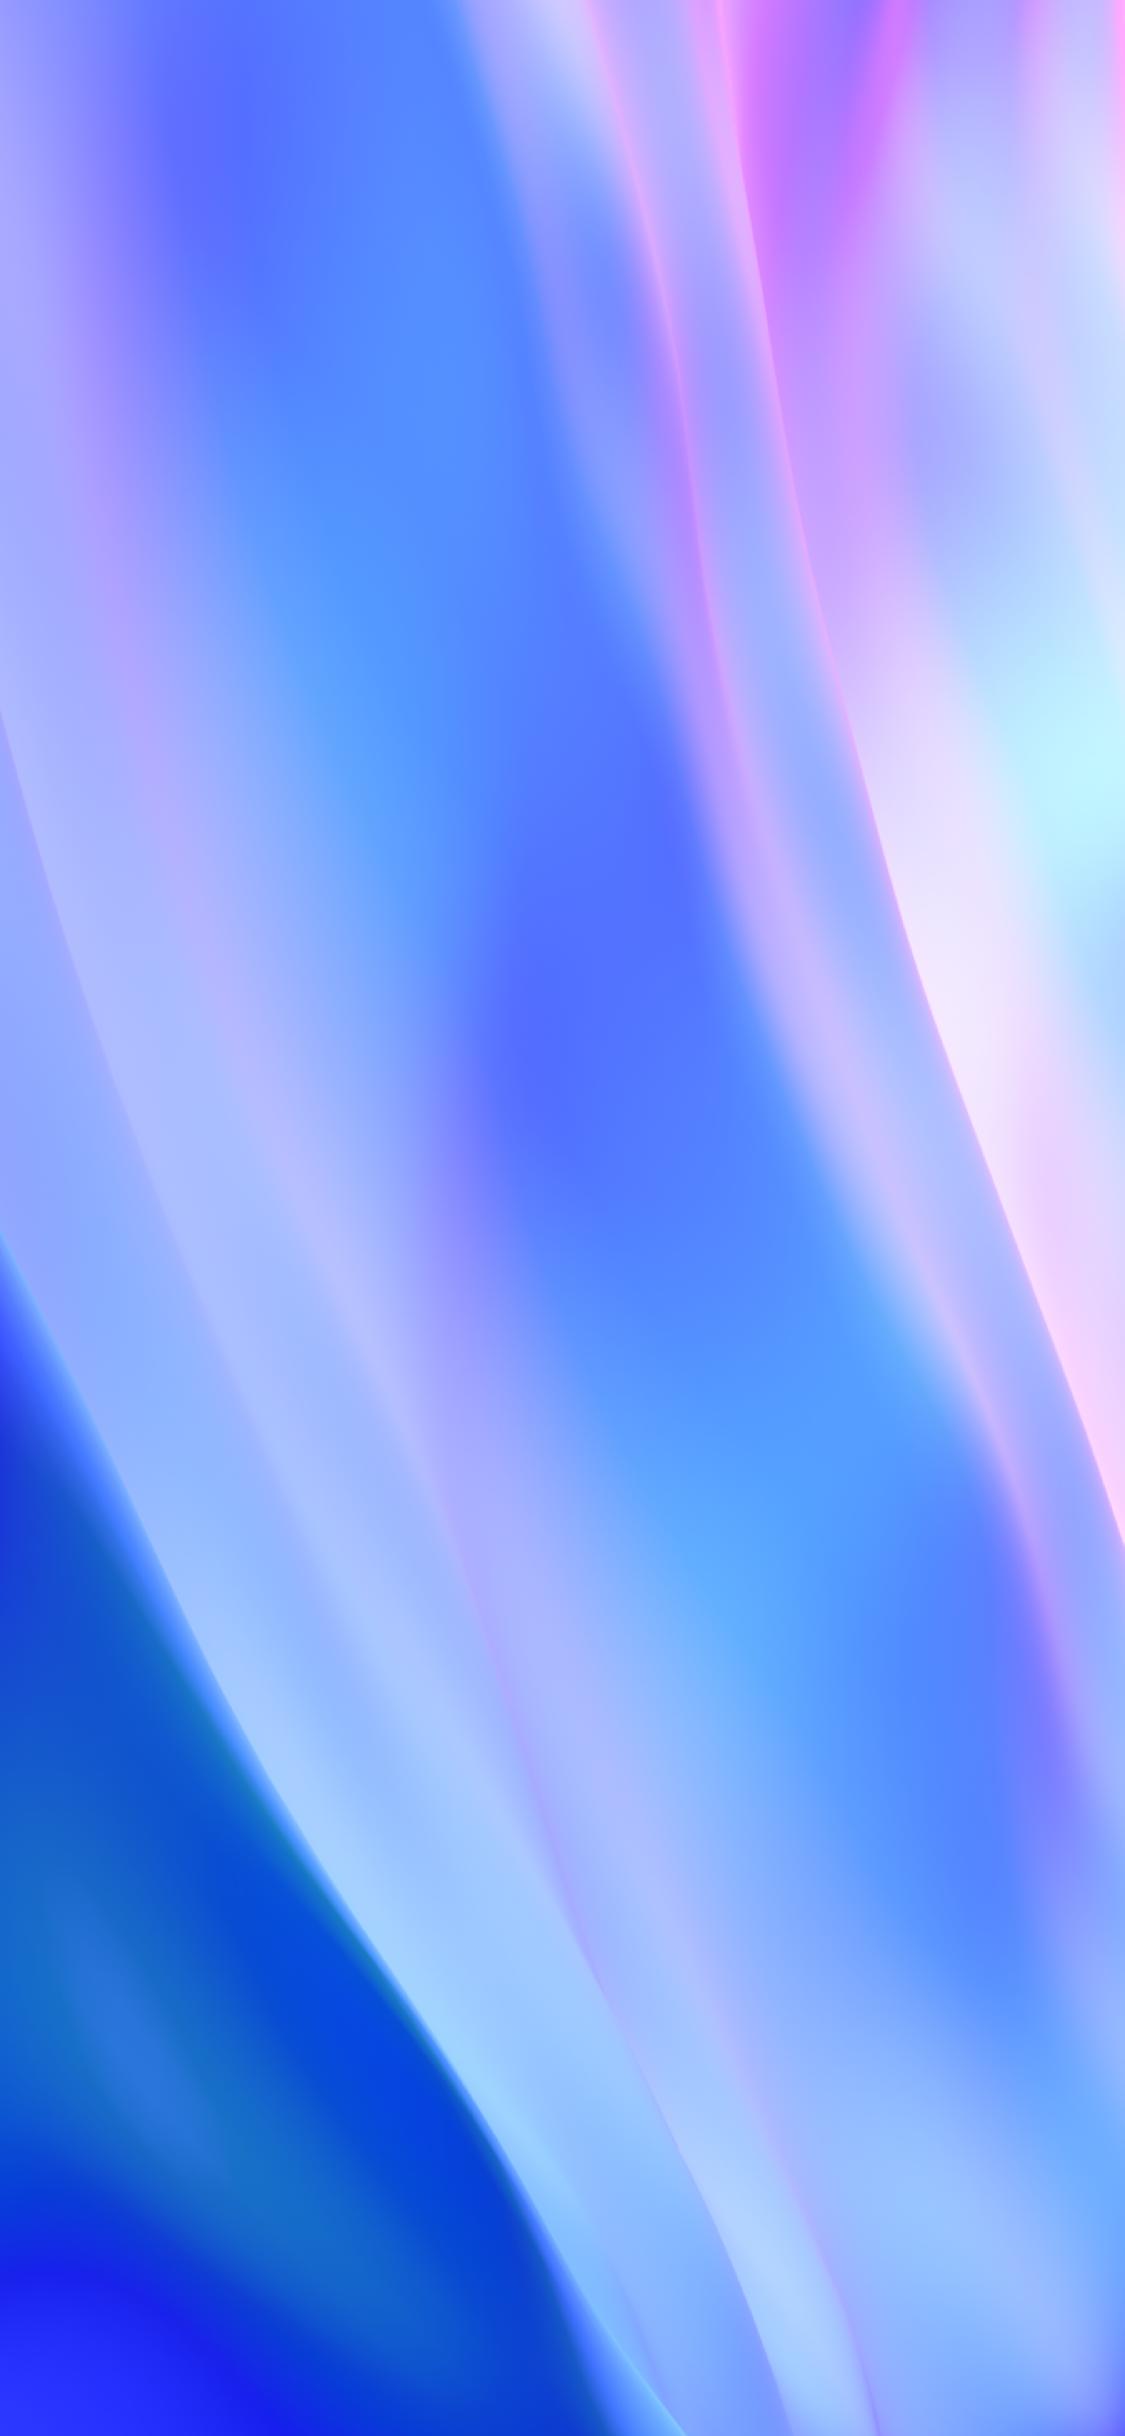 IPhone X Wallpaper 7.png 1,125×2,436 Pixeles